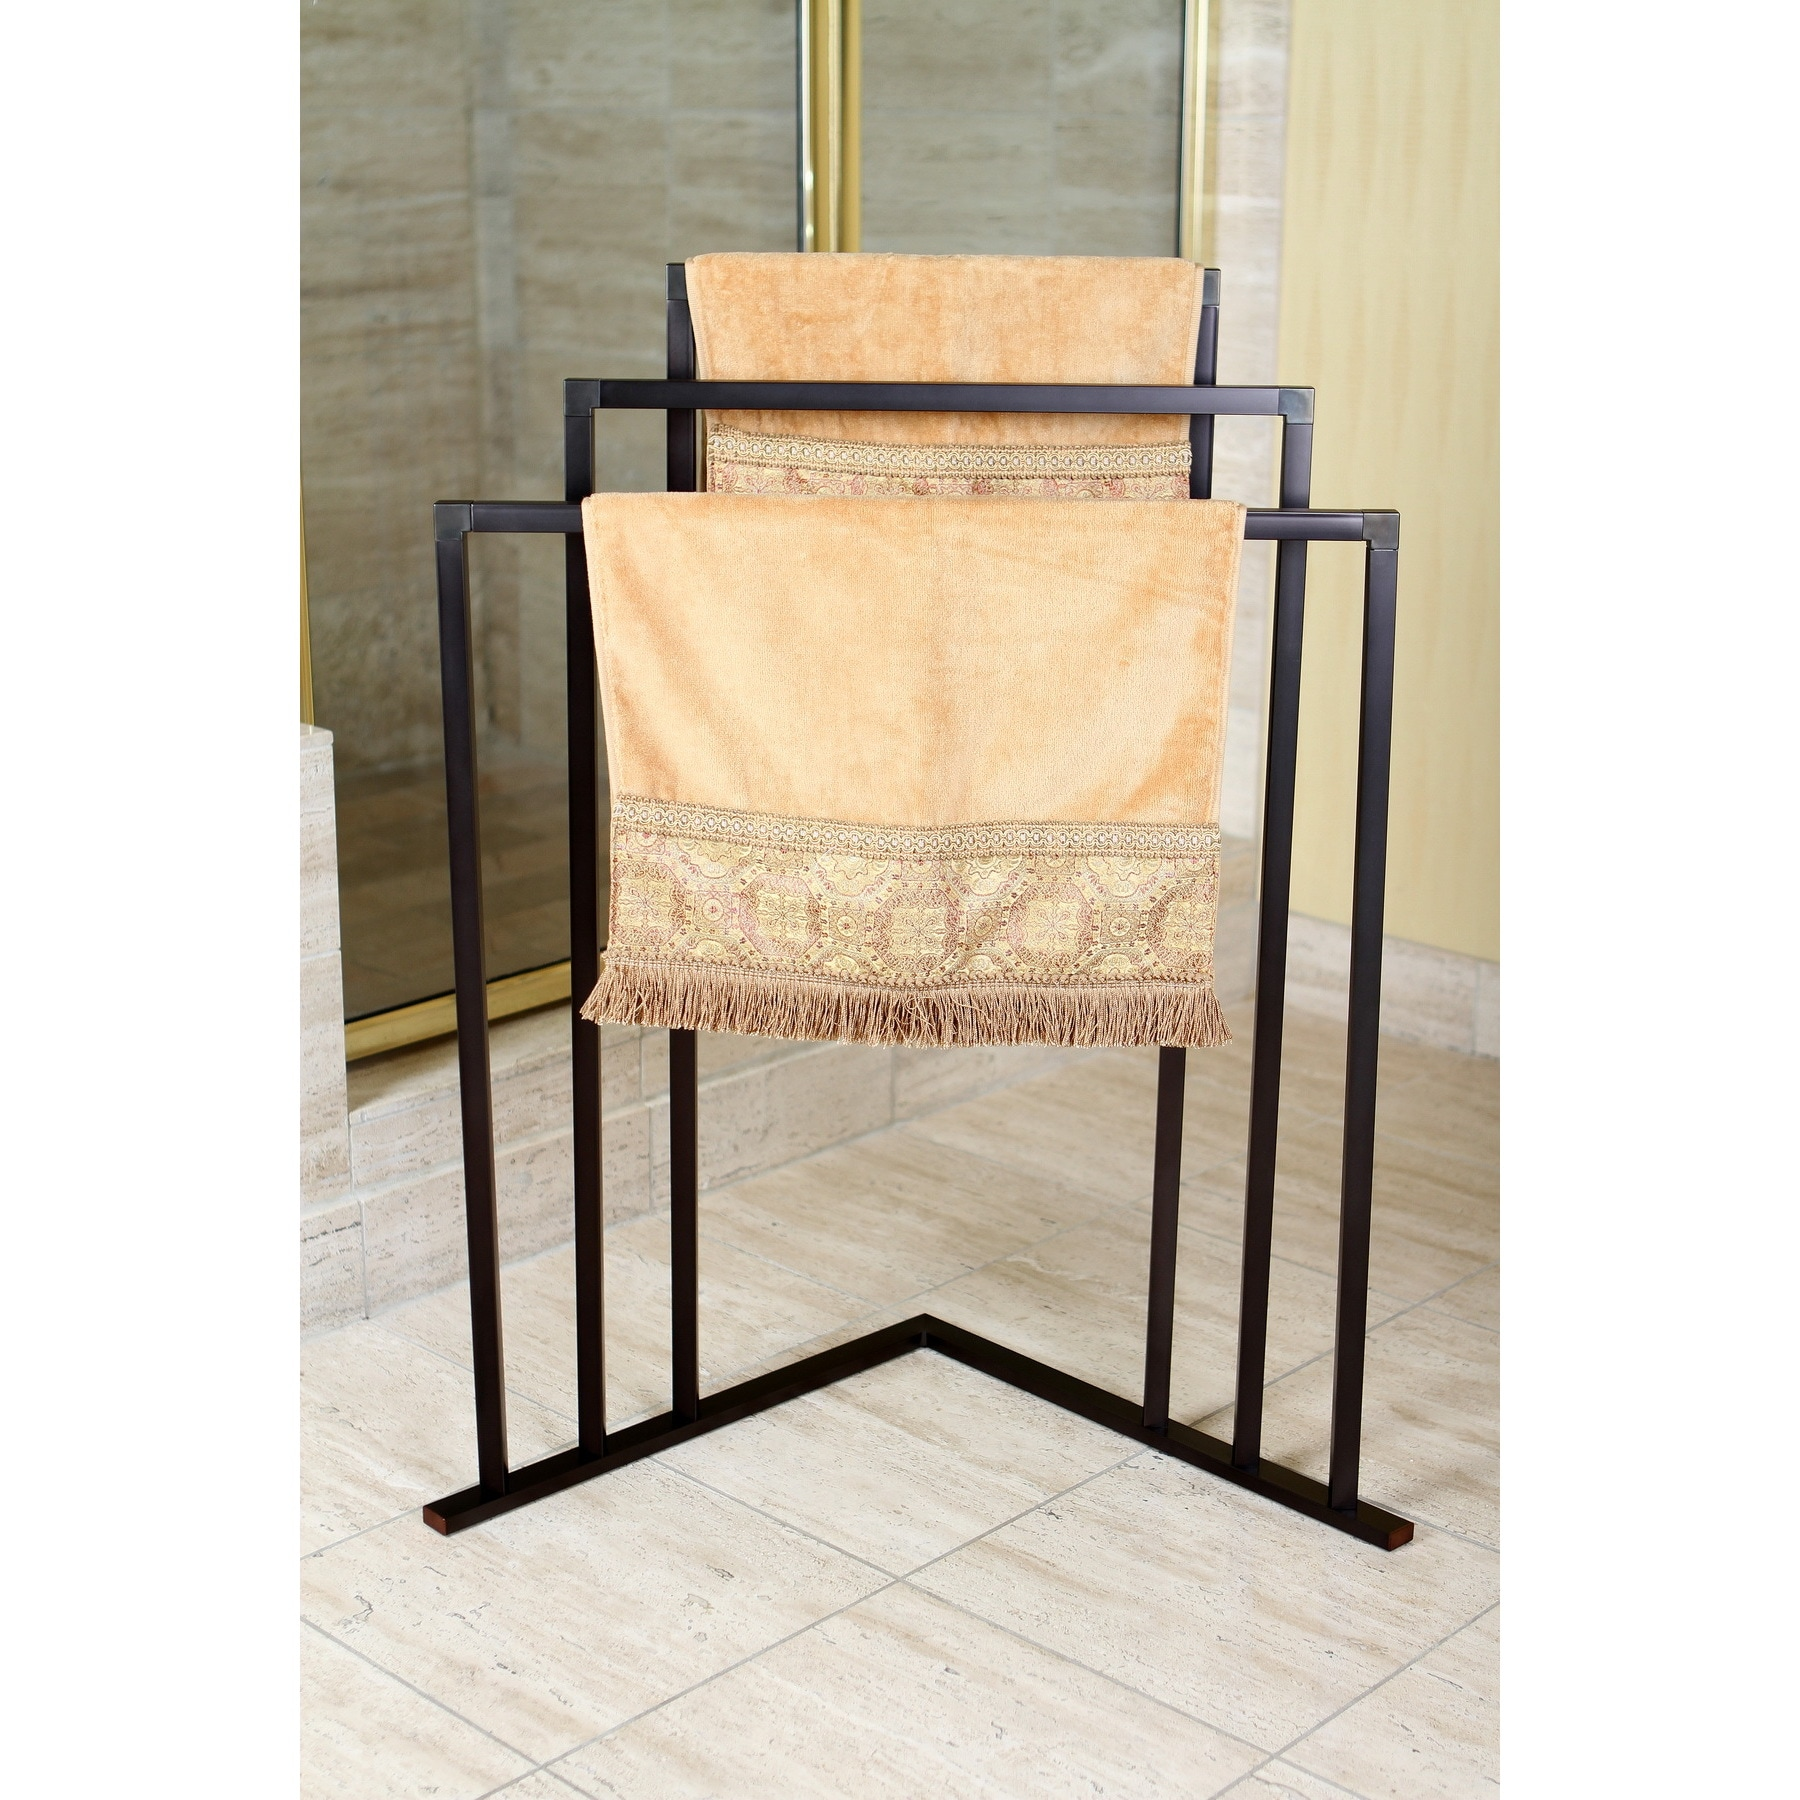 Oil Rubbed Bronze 3-tier Iron Construction Corner Towel Rack